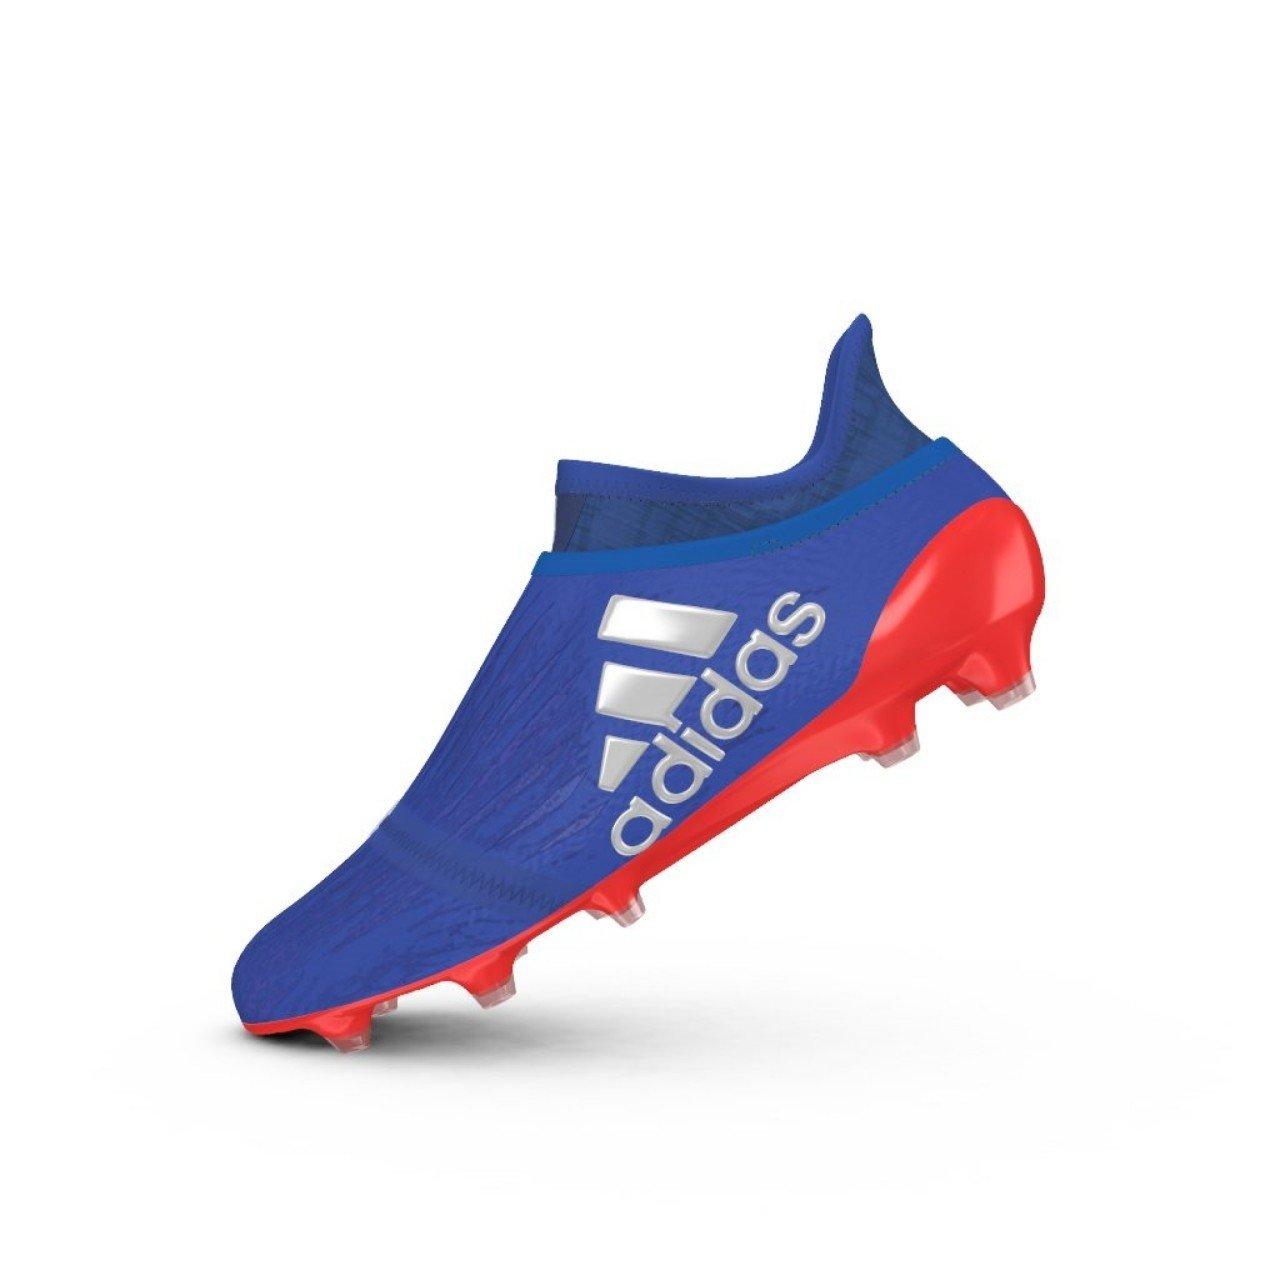 Adidas X 16+ Purechaos Fg - Croyal Solrot Solrot